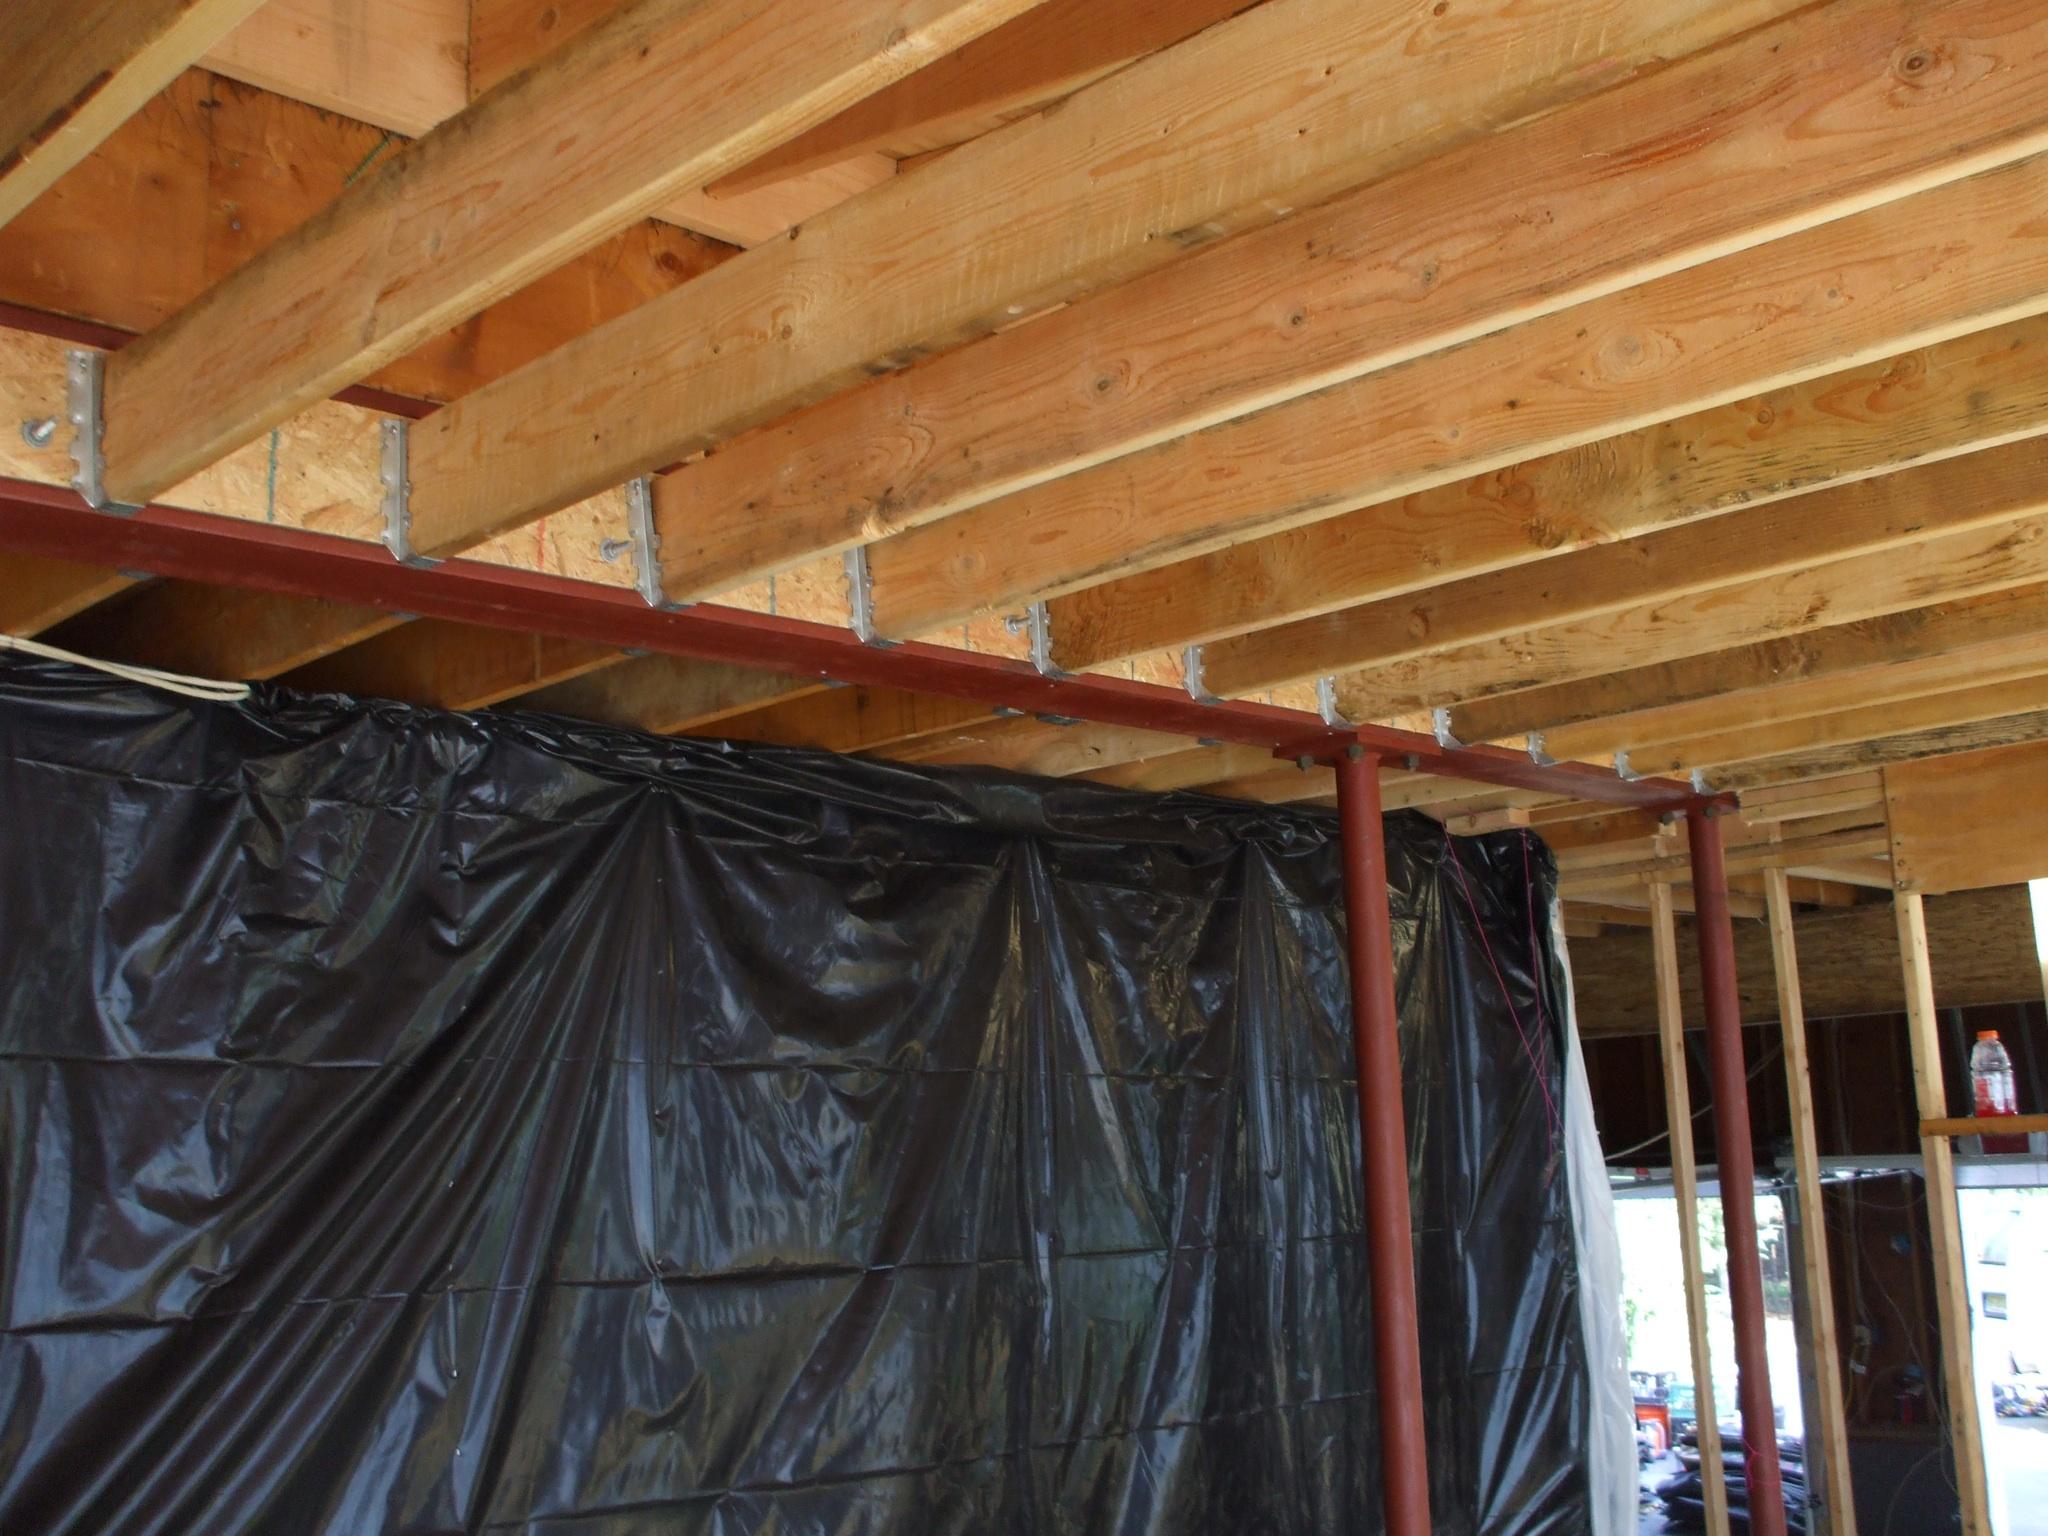 Attaching 2x6 ceiling joists to steel beam, web blocking-photo-apr-21-3-01-20-pm.jpg